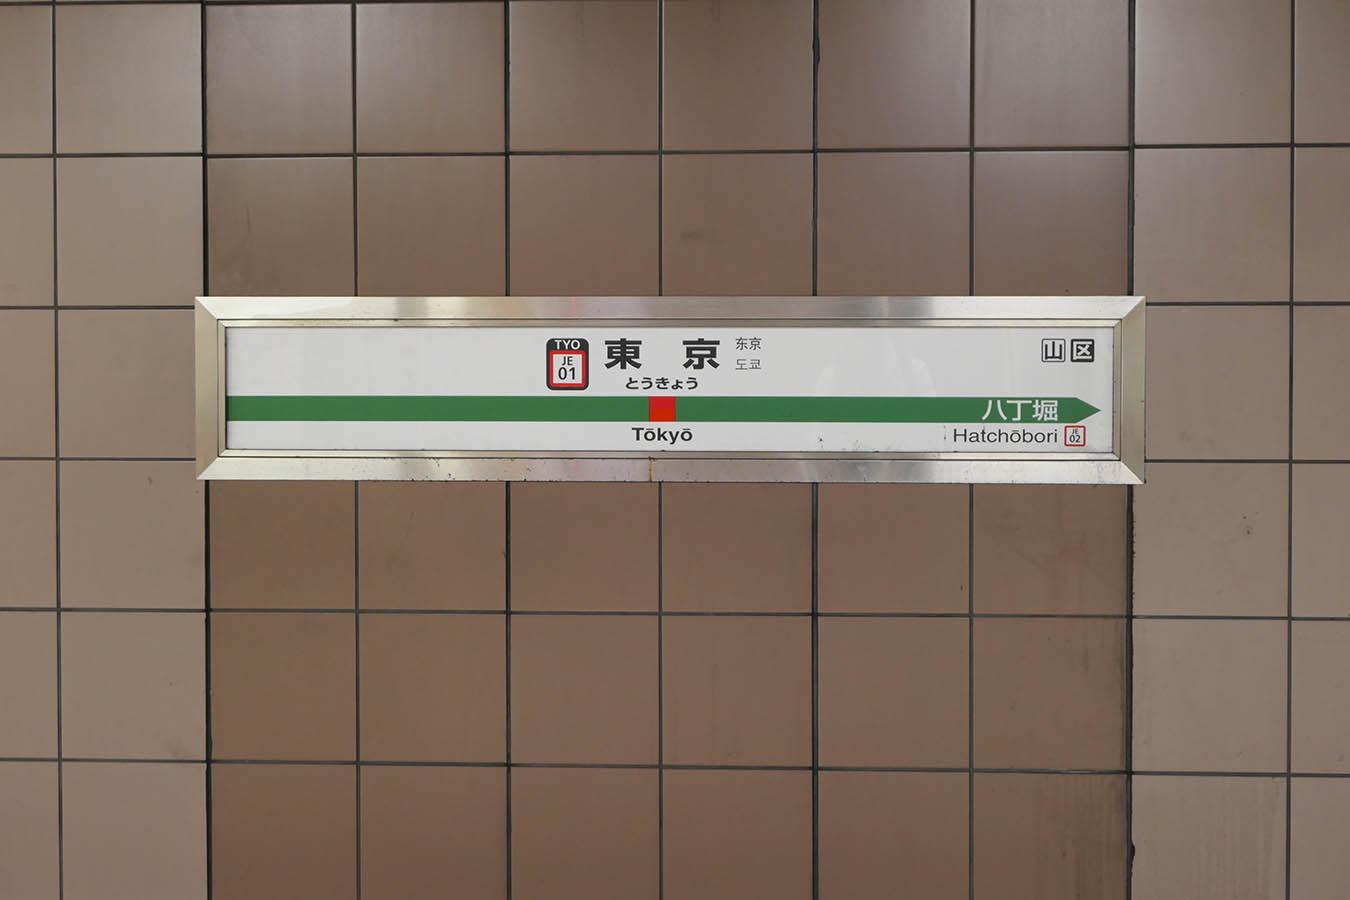 JE01_photo07.jpg